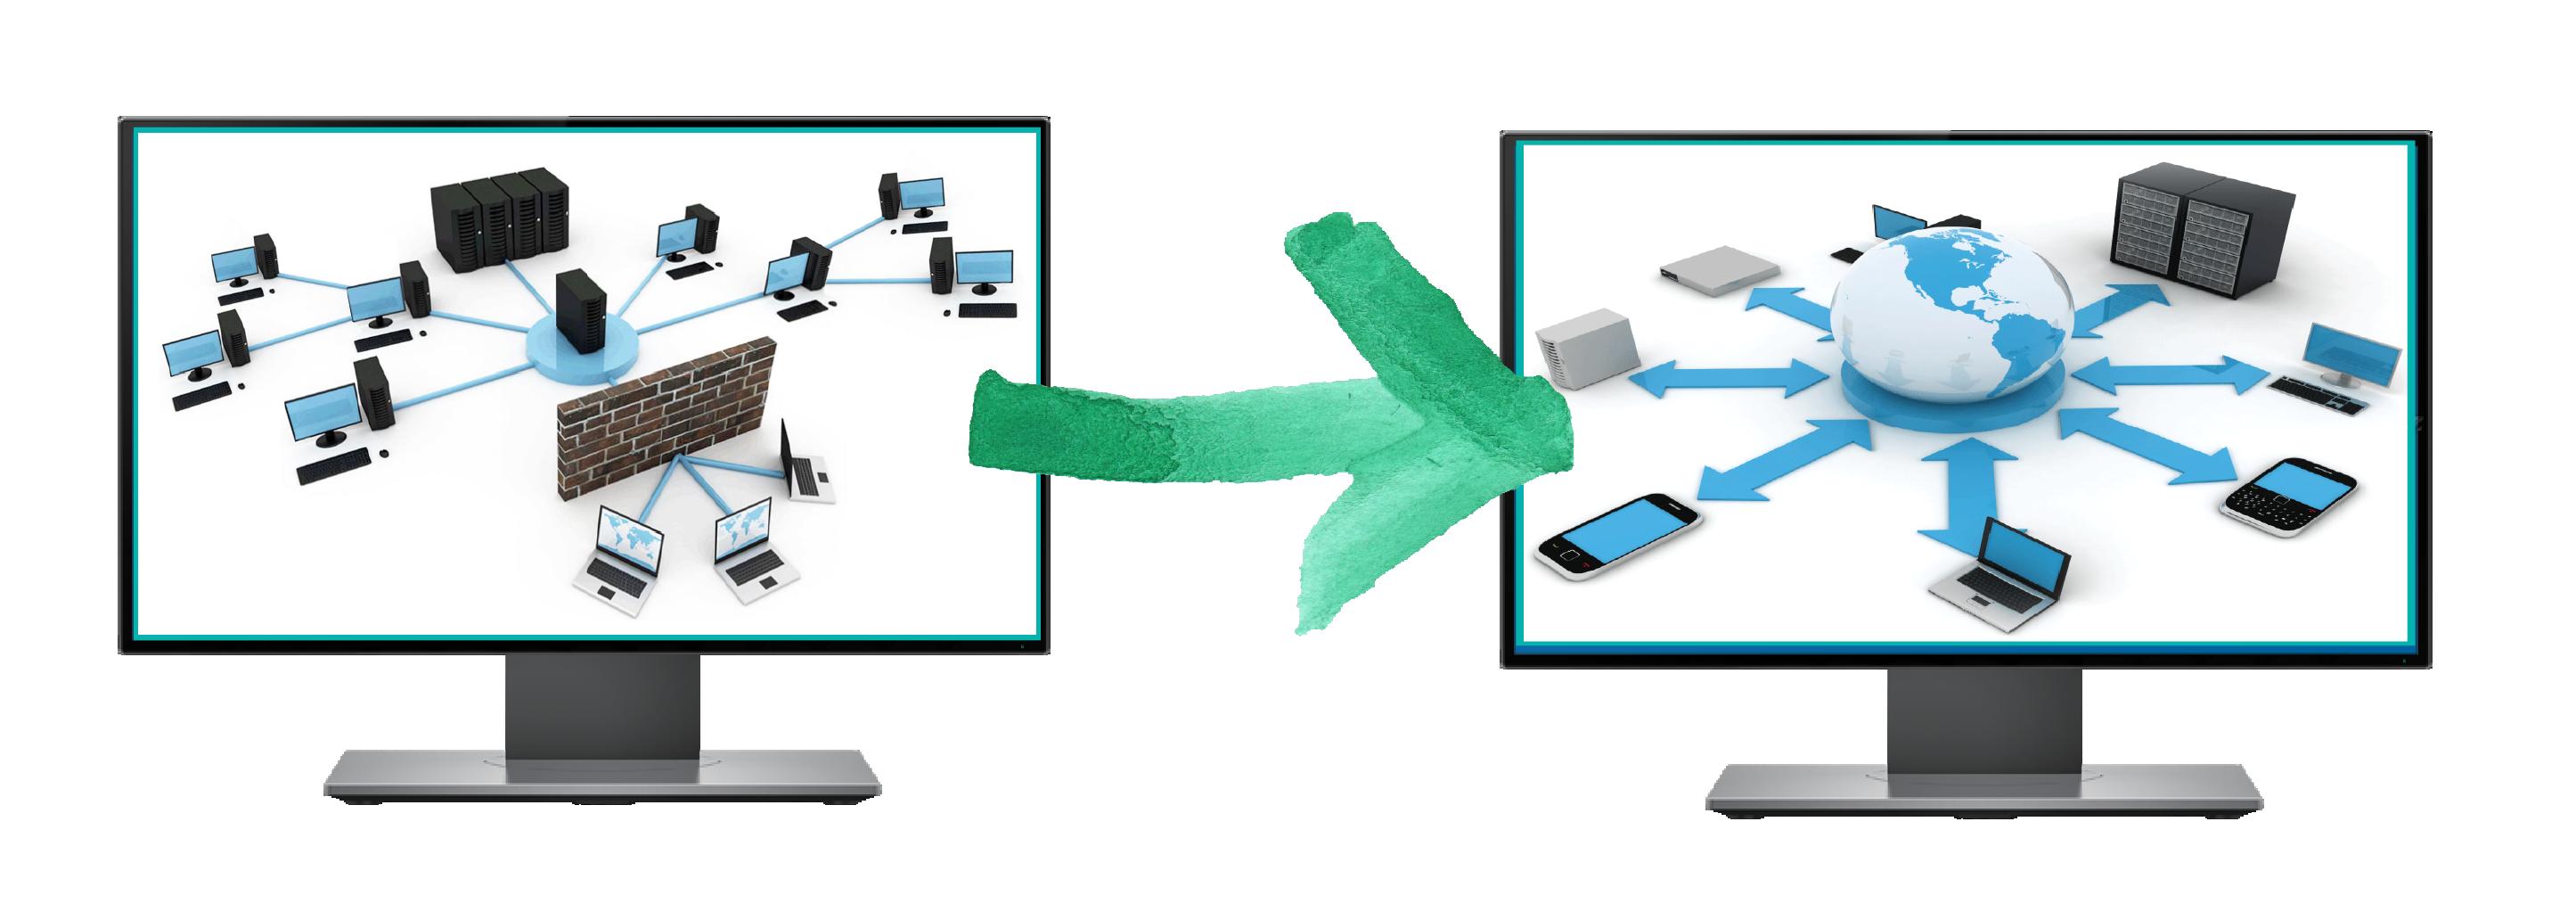 procurement_process-img.png